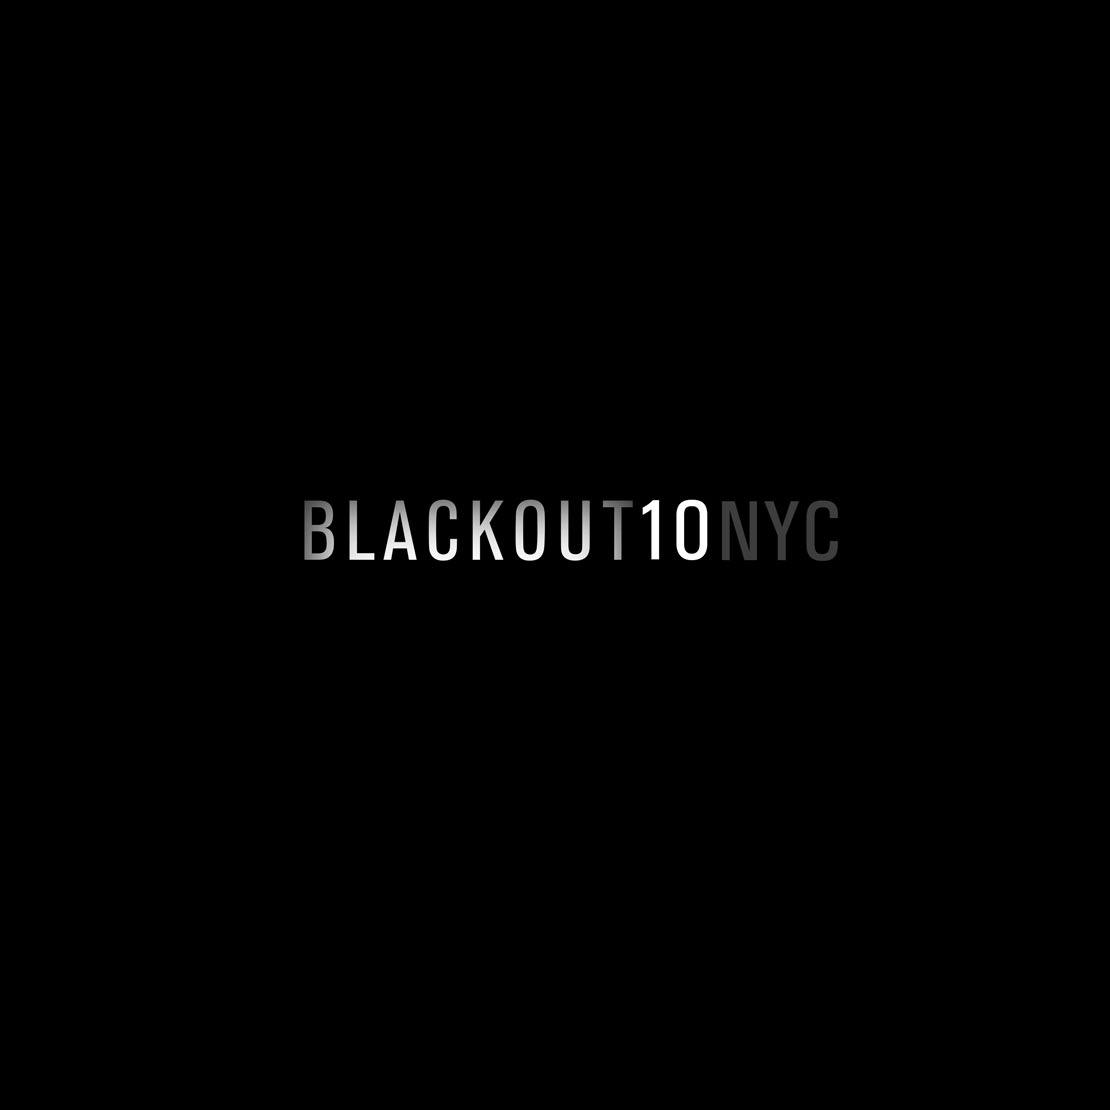 Blackout10_2.jpg